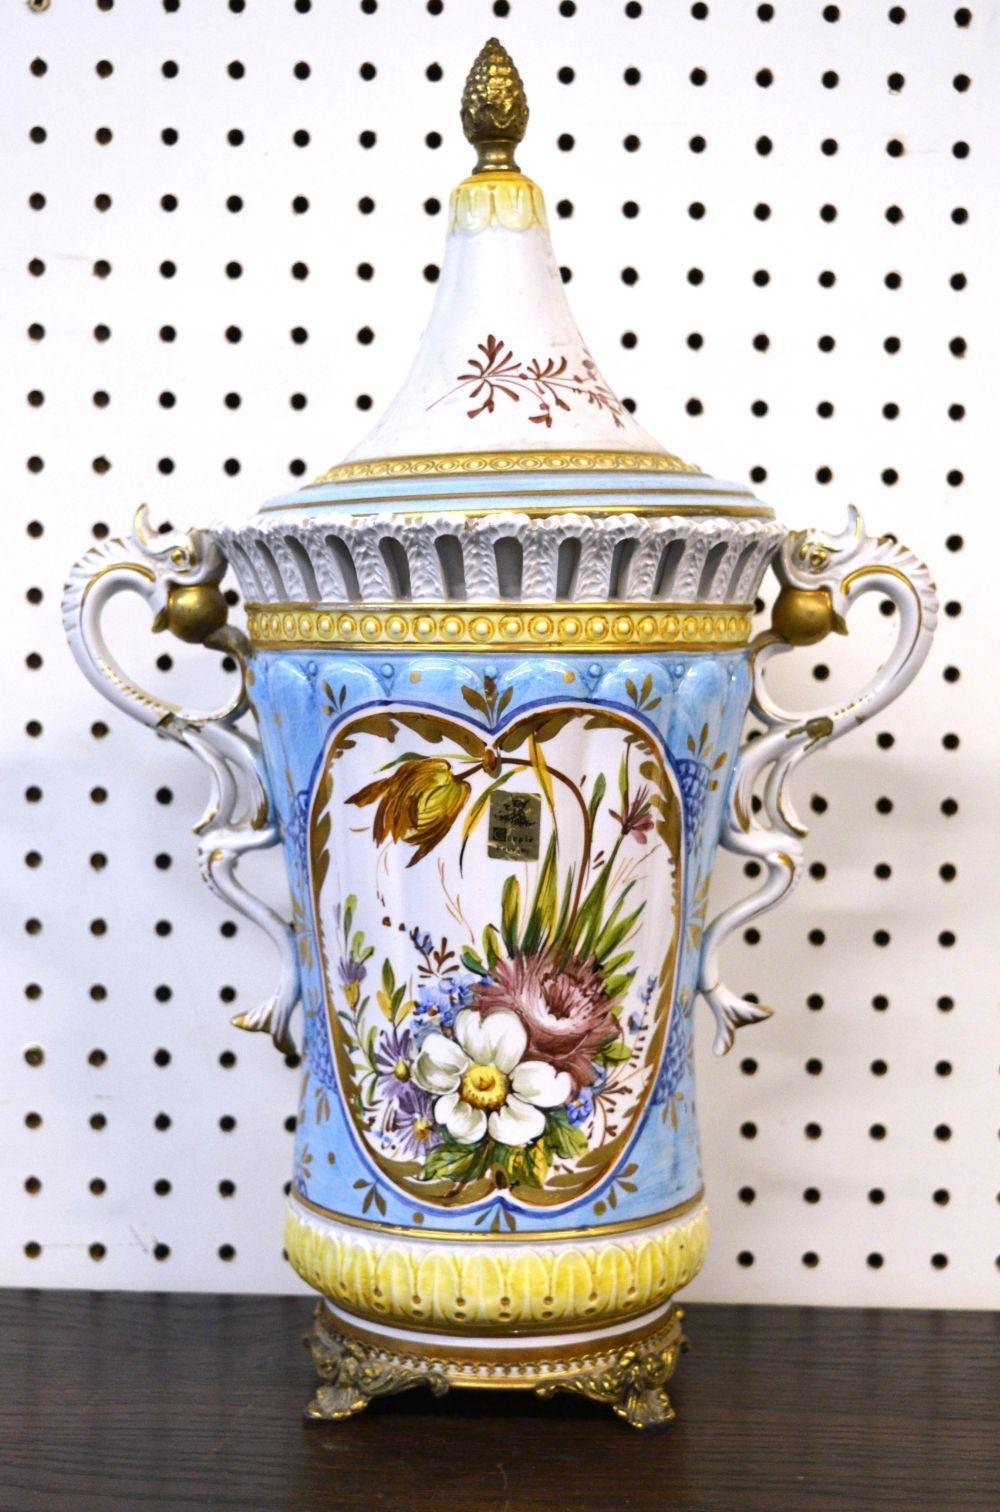 Vintage Capodimonte porcelain vase